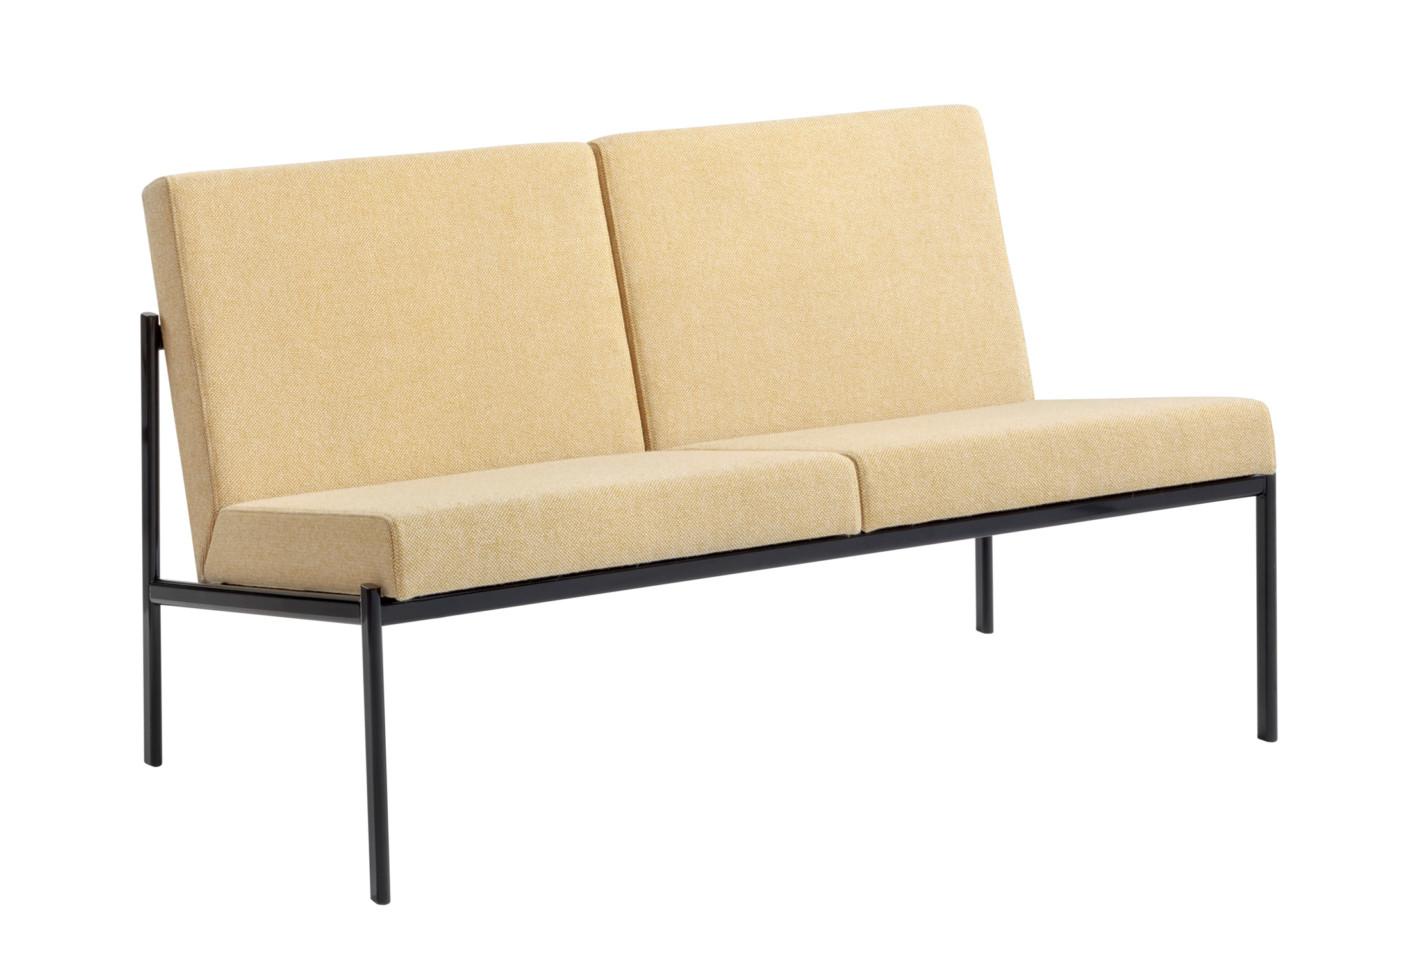 kiki sofa by artek stylepark. Black Bedroom Furniture Sets. Home Design Ideas